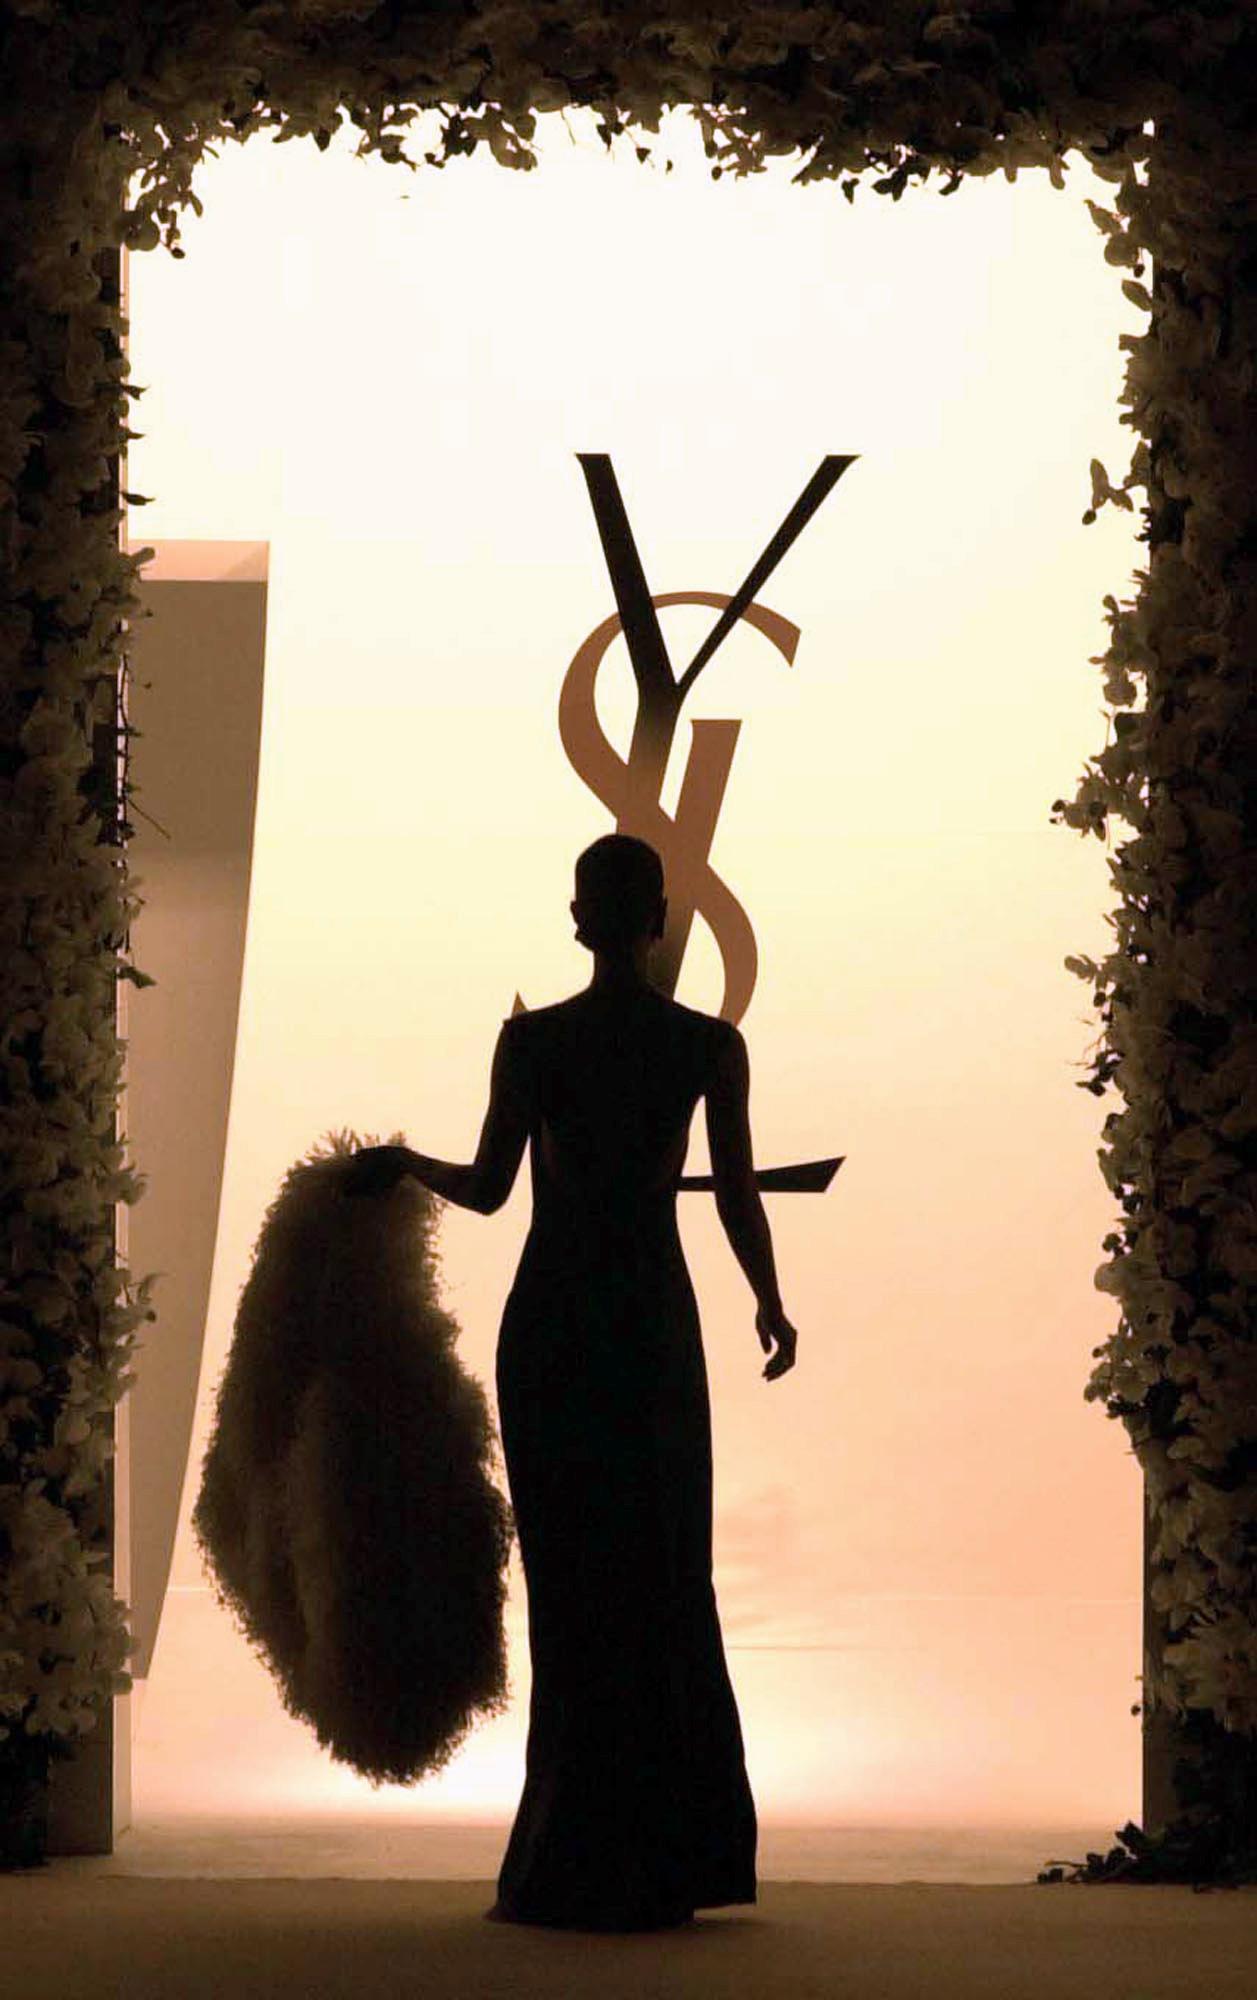 Yves Saint Laurent 40th Year Retrospective - Centre Pompidou January 22nd 2002